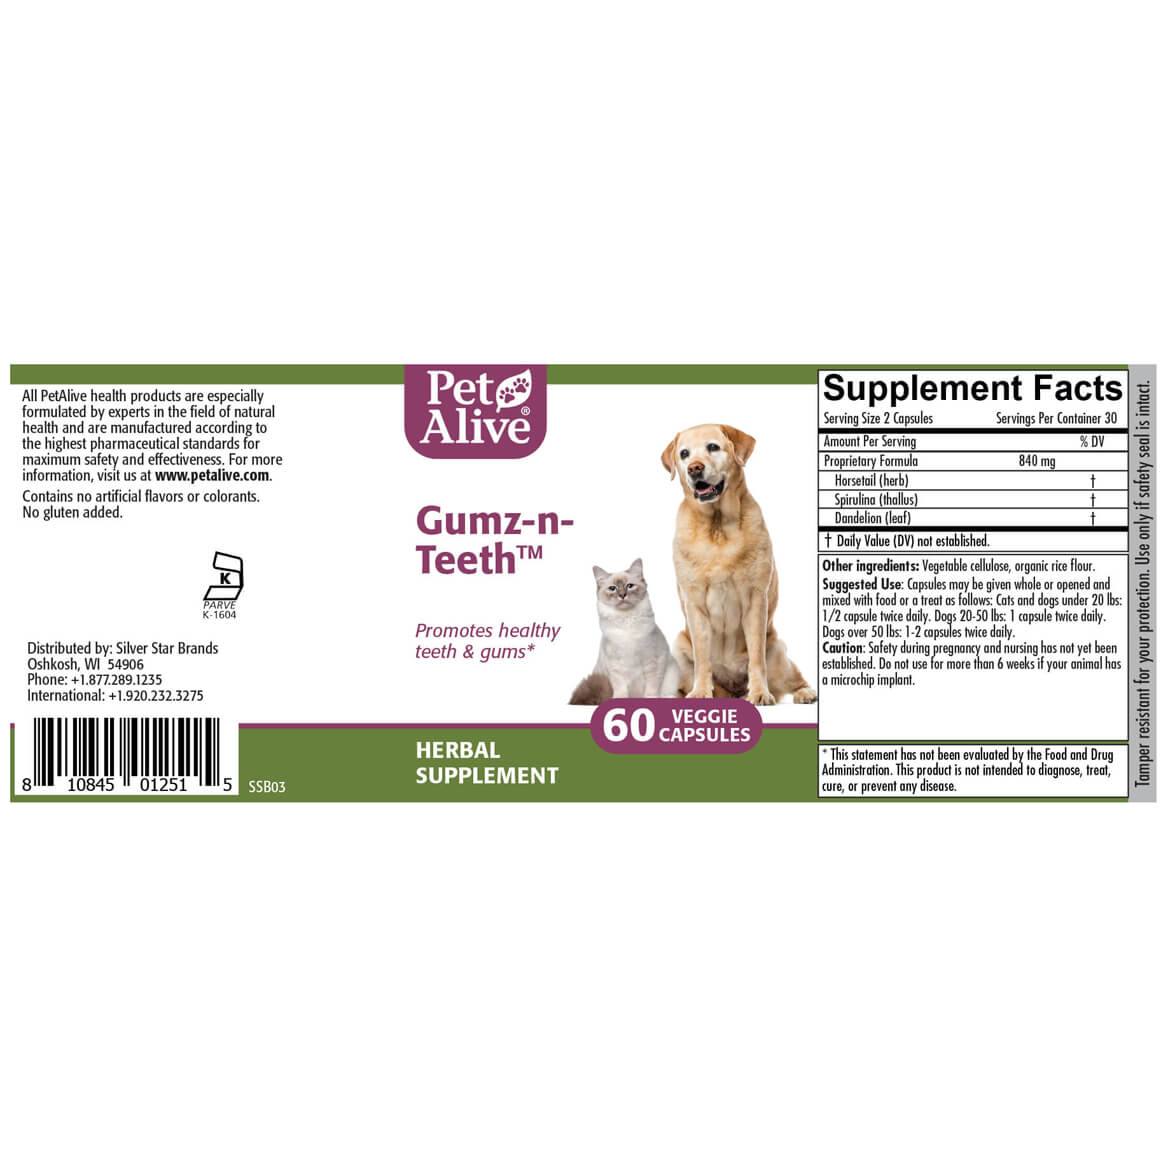 Gumz-n-Teeth™ for Pet Oral Health-351913